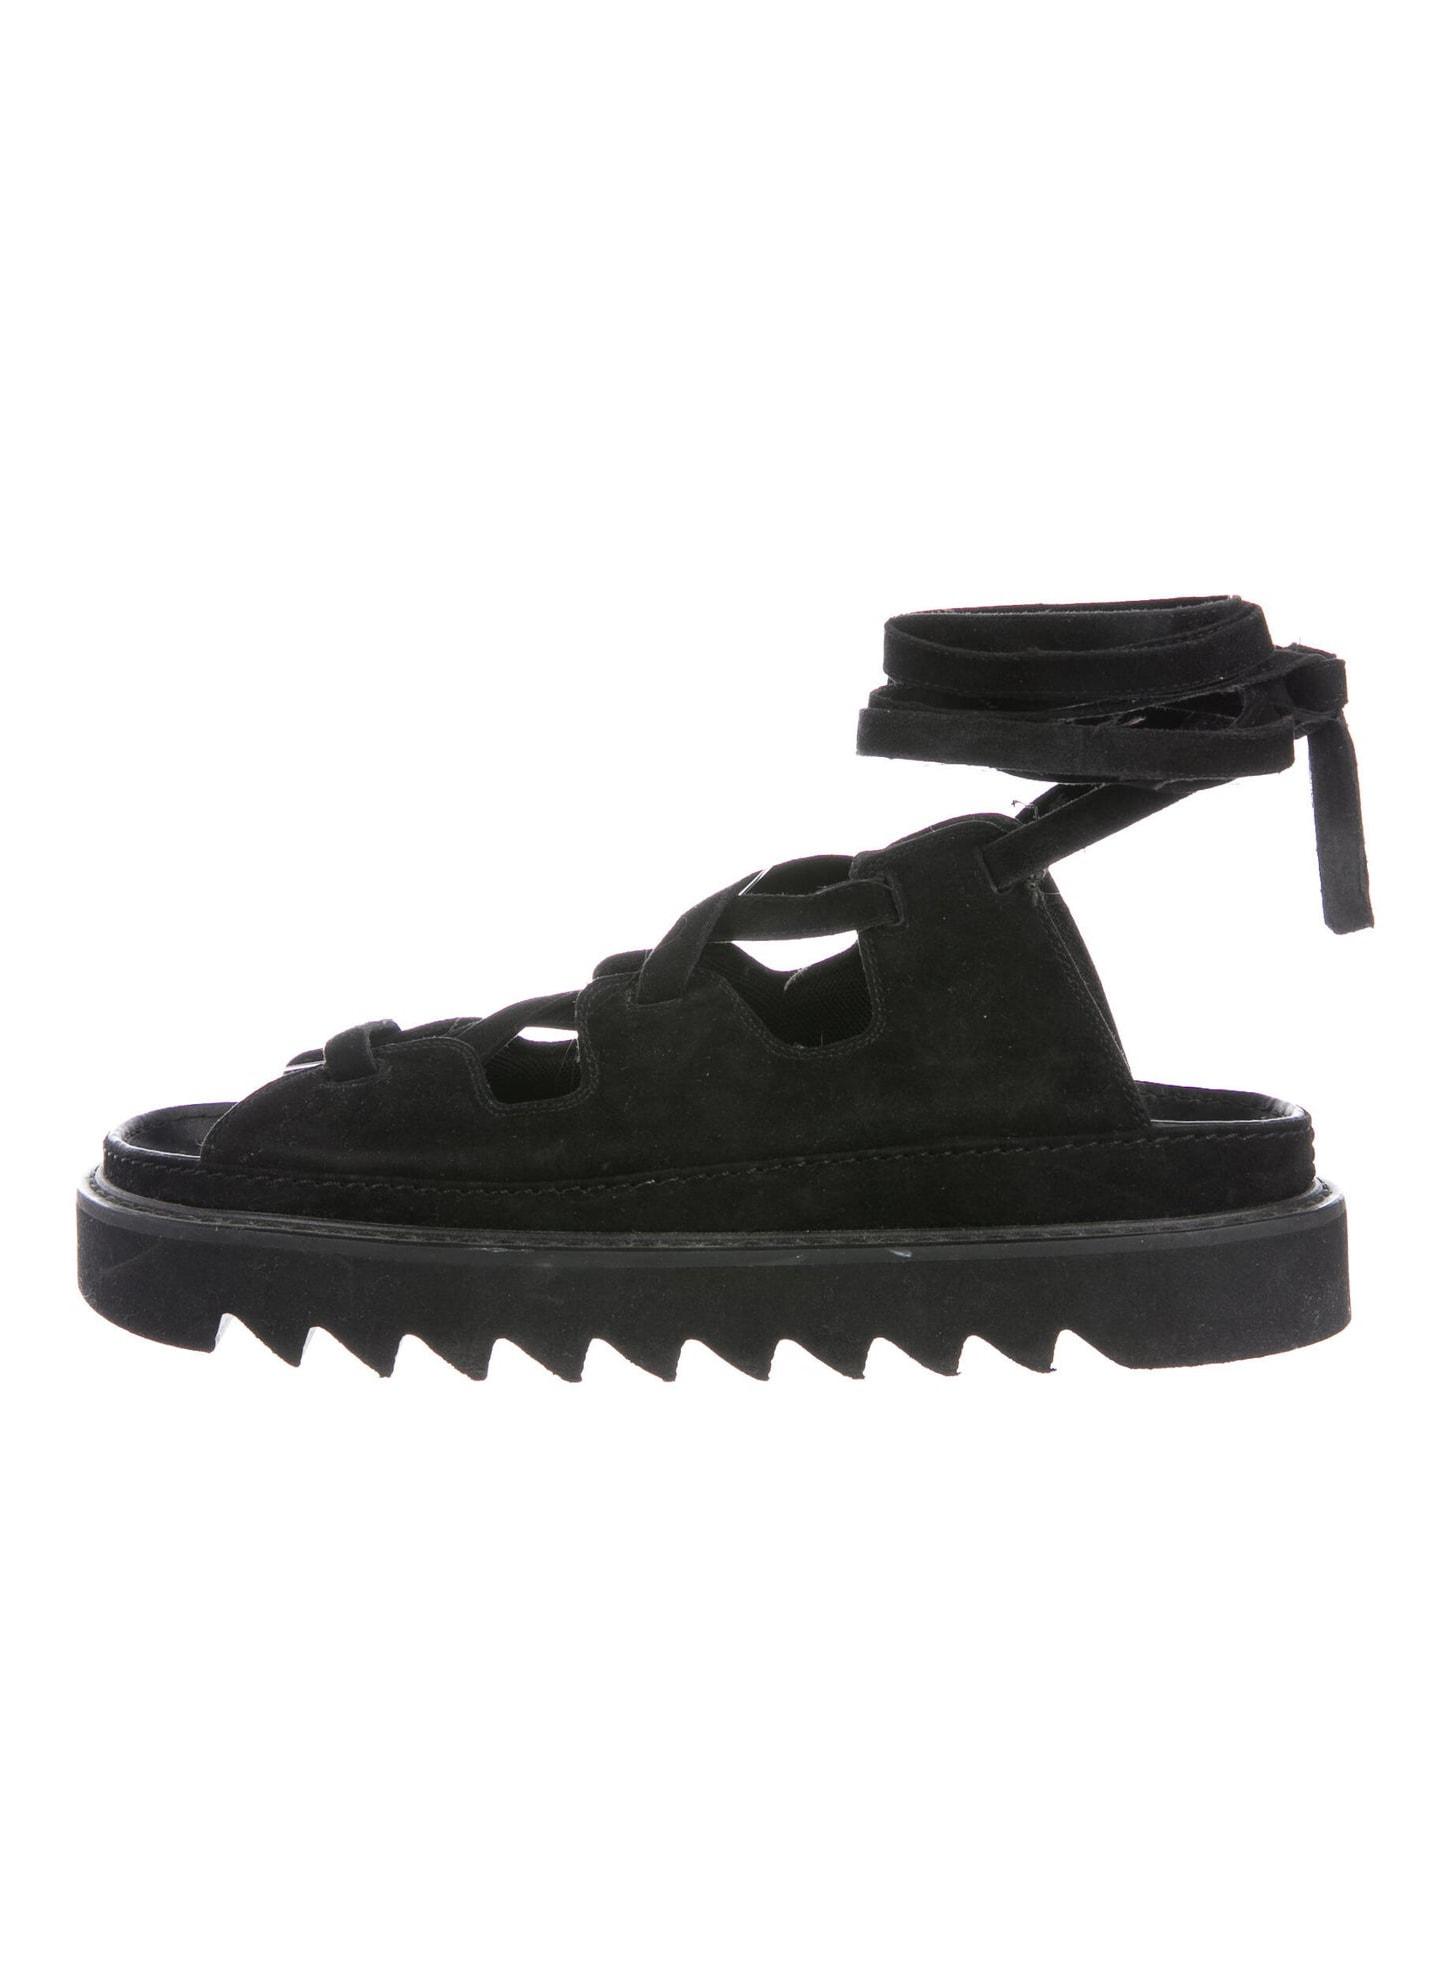 CELINE Suede Sandals